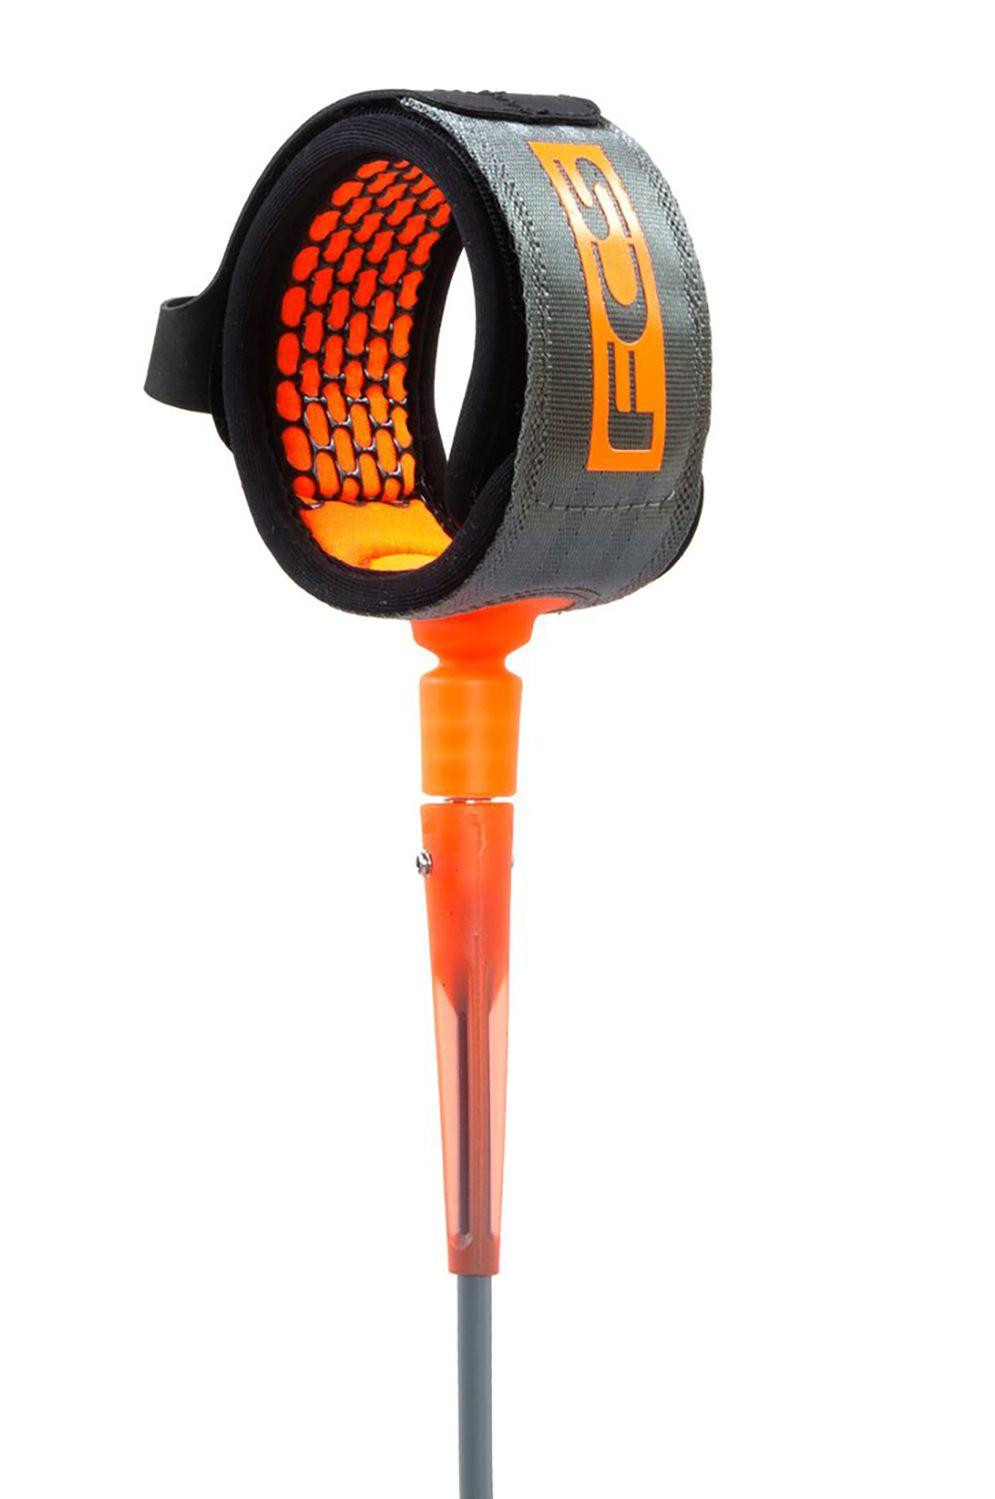 Fcs Leash 7' ALL ROUND ESSENTIAL Charcoal/Blood Orange